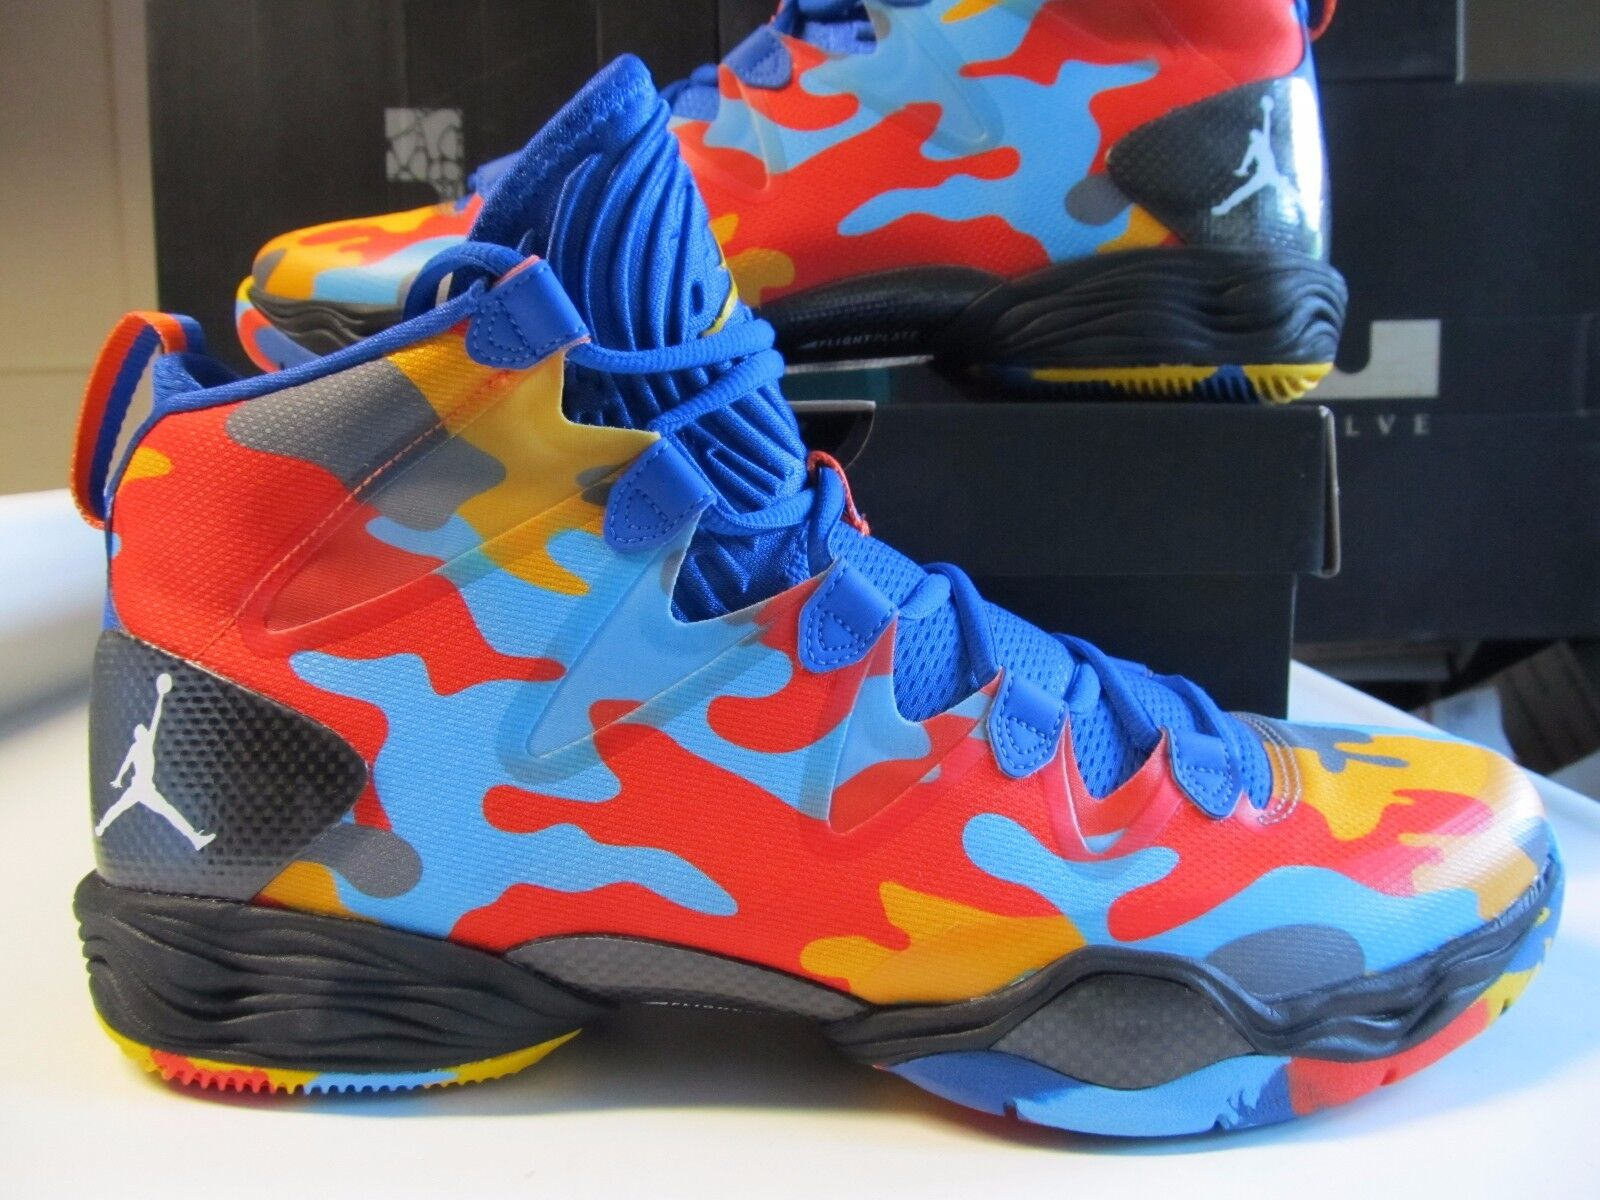 newest 05c80 13e3e Nike Air Jordan XX8 SE CAMO Blue Org RUSSELL WESTBROOK 616345 450 28 okc  thunder